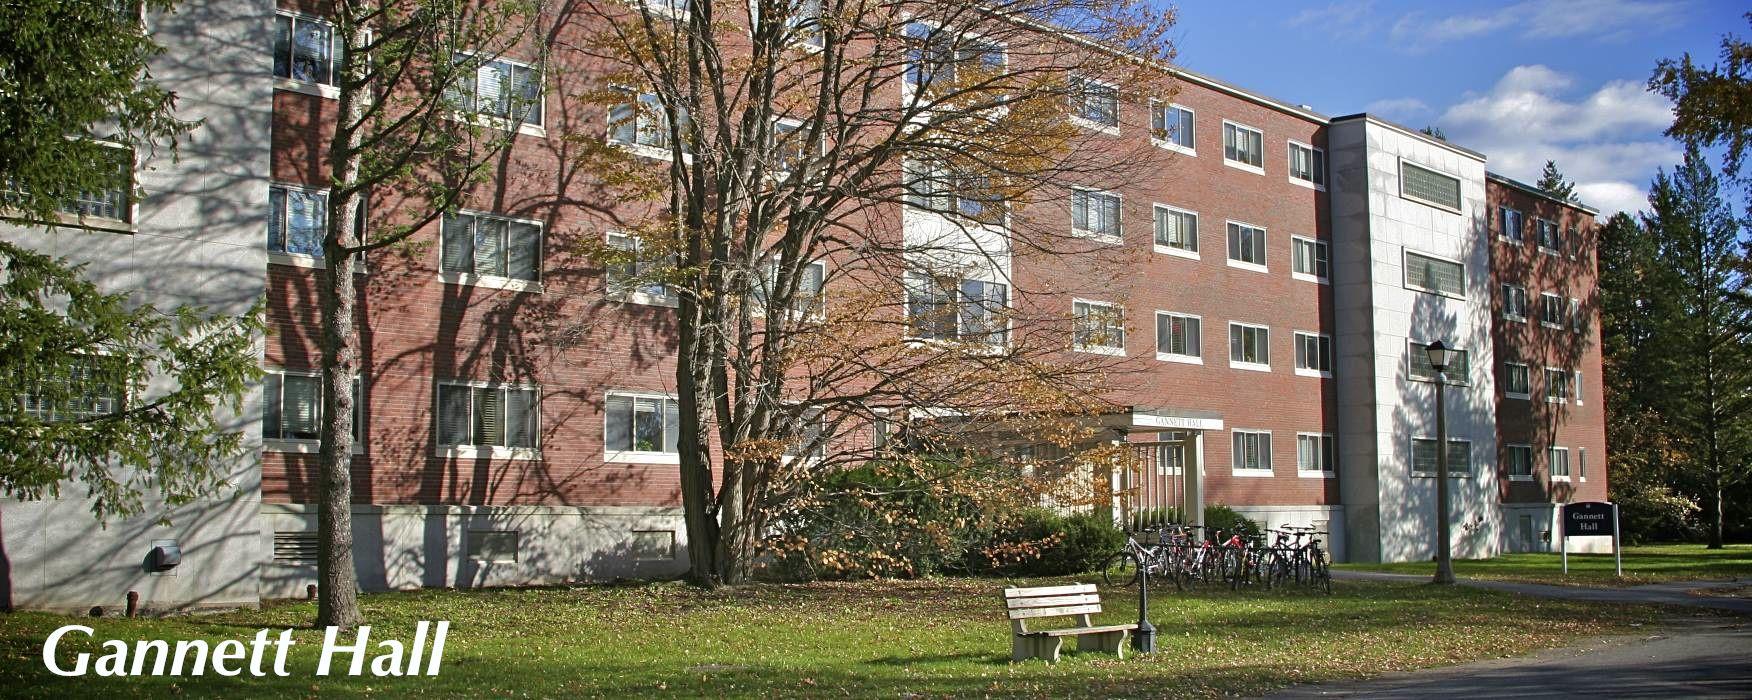 Gannett Hall, first year housing.   UMaine Housing   Pinterest ...